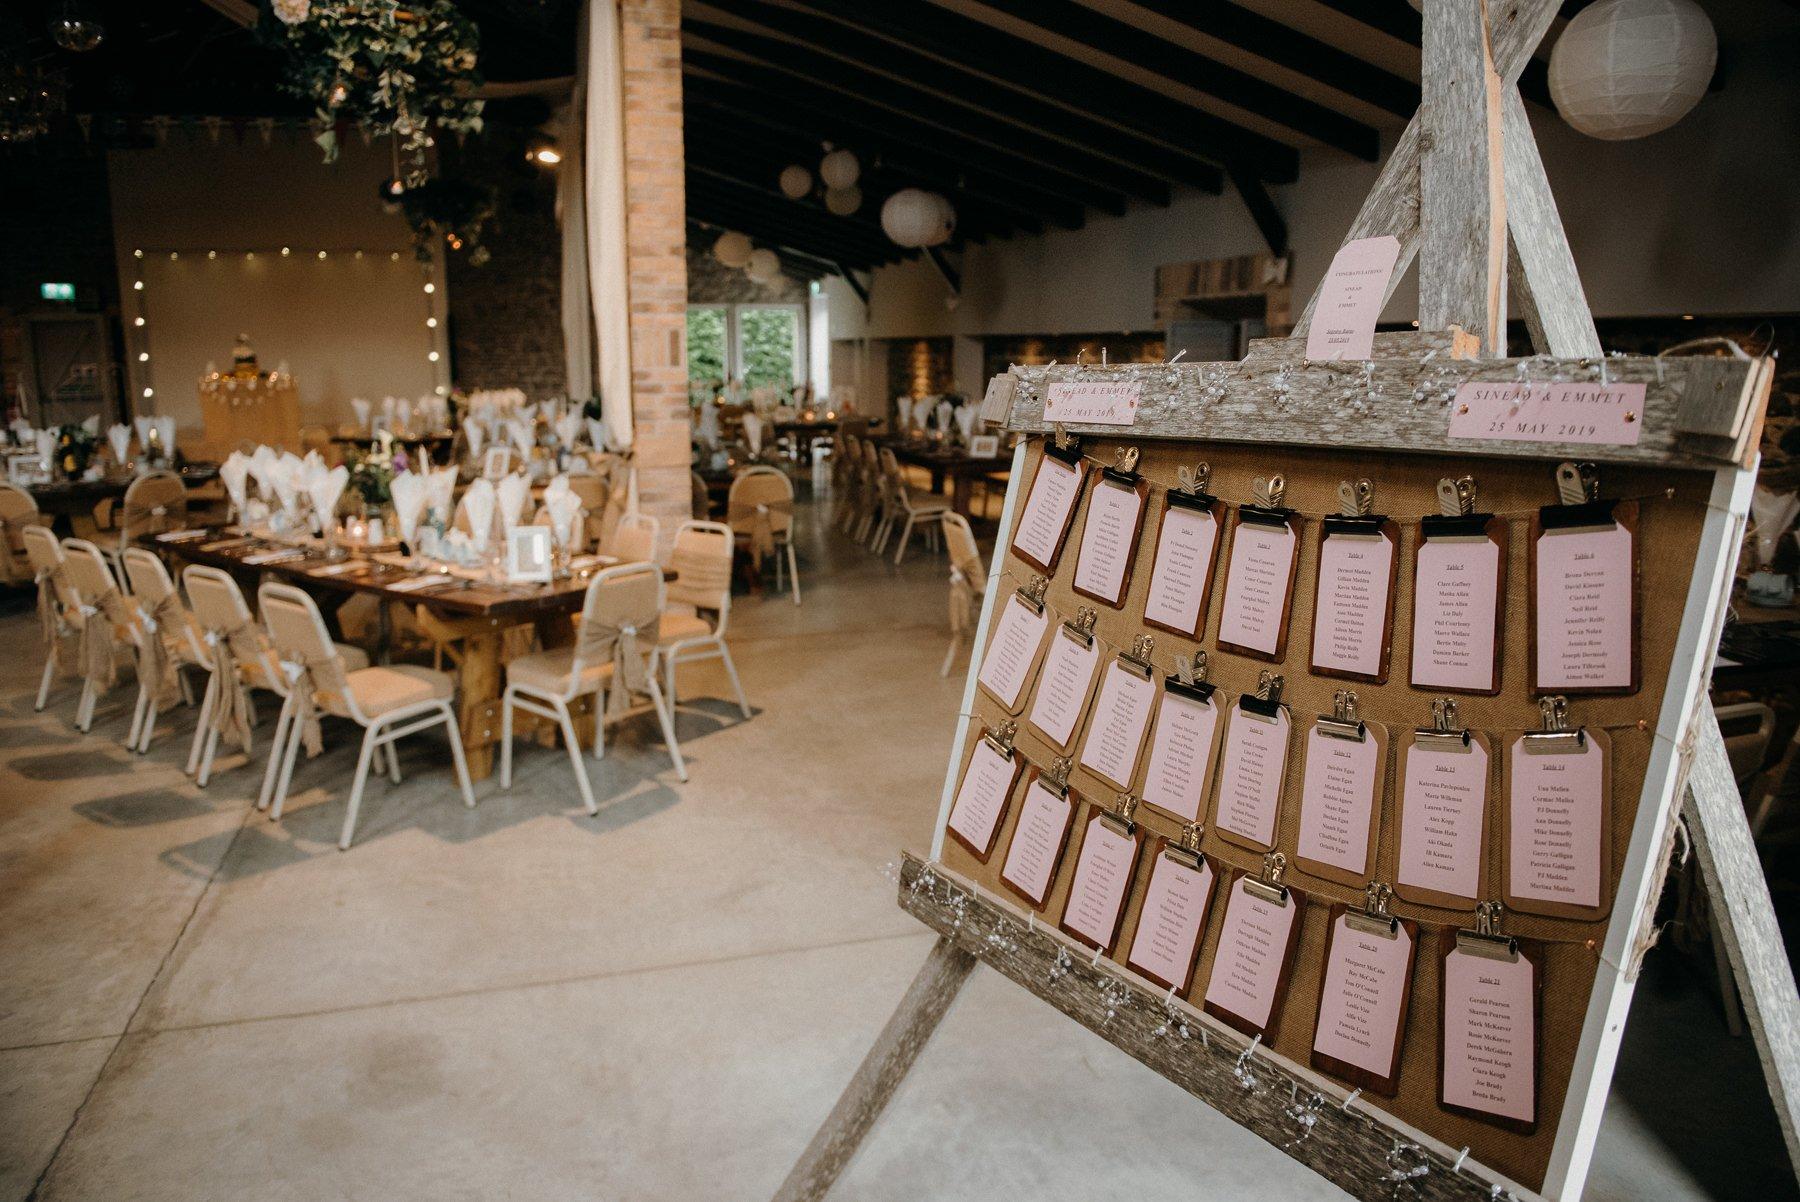 segrave-barns-wedding-in-ireland-rustic-decor